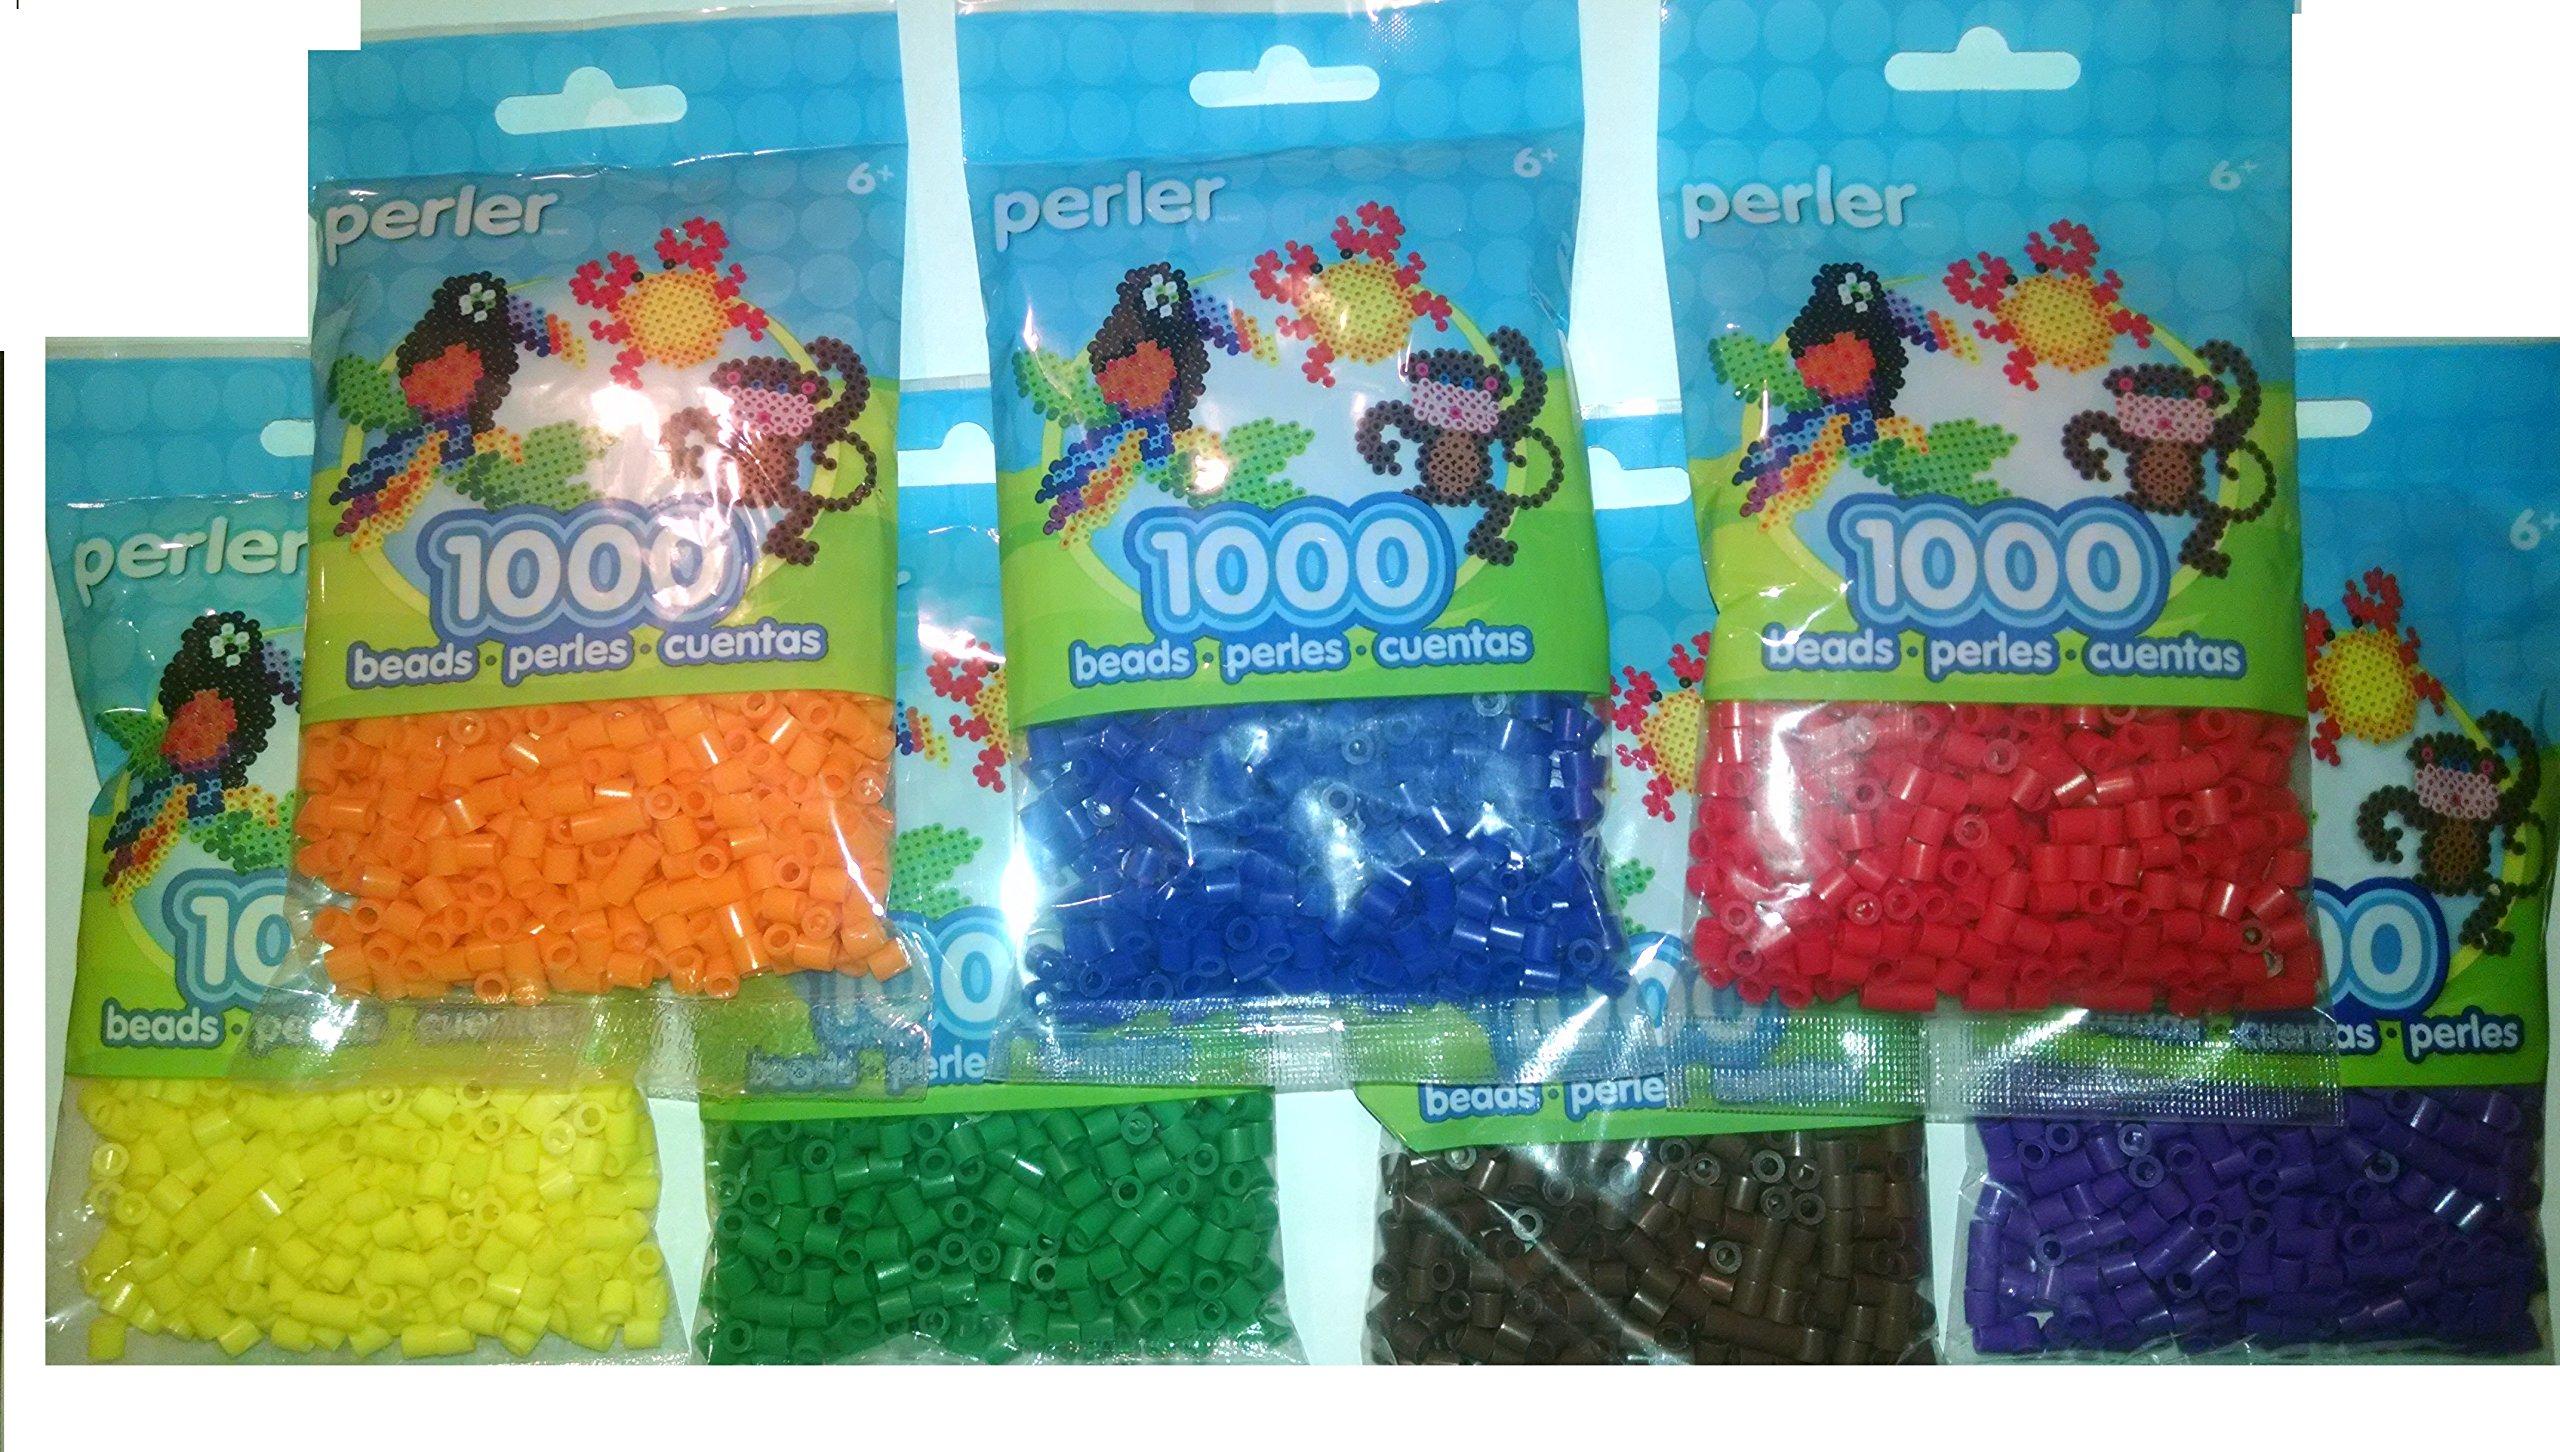 Perler Bead Bag, 7 Basic Color Group (D Blue, D Green, Red, Orange, Yellow, Purple, Brown) by Perler